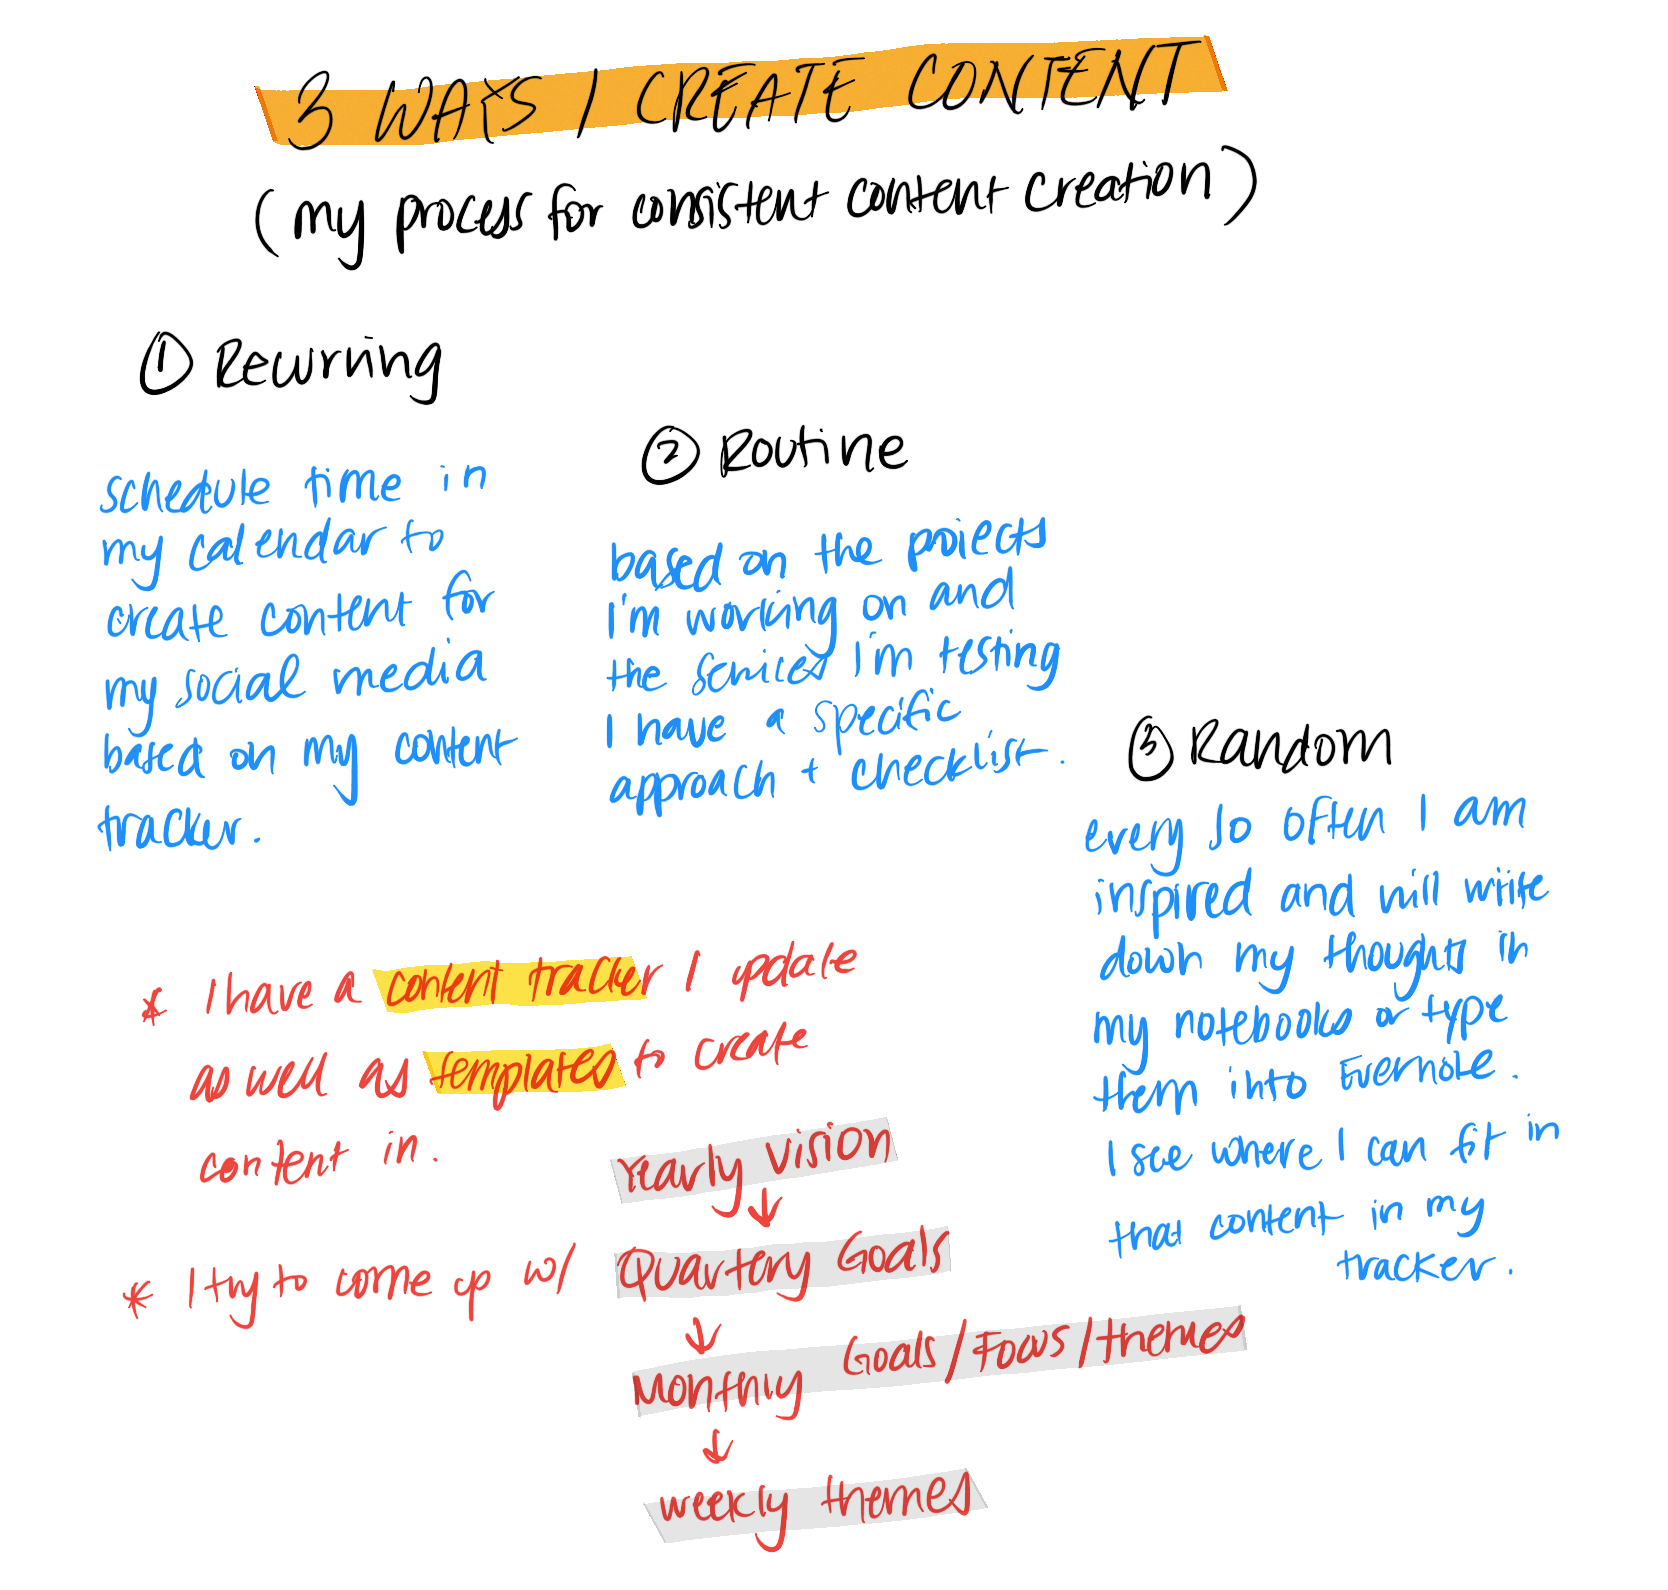 Consistent Content Summary